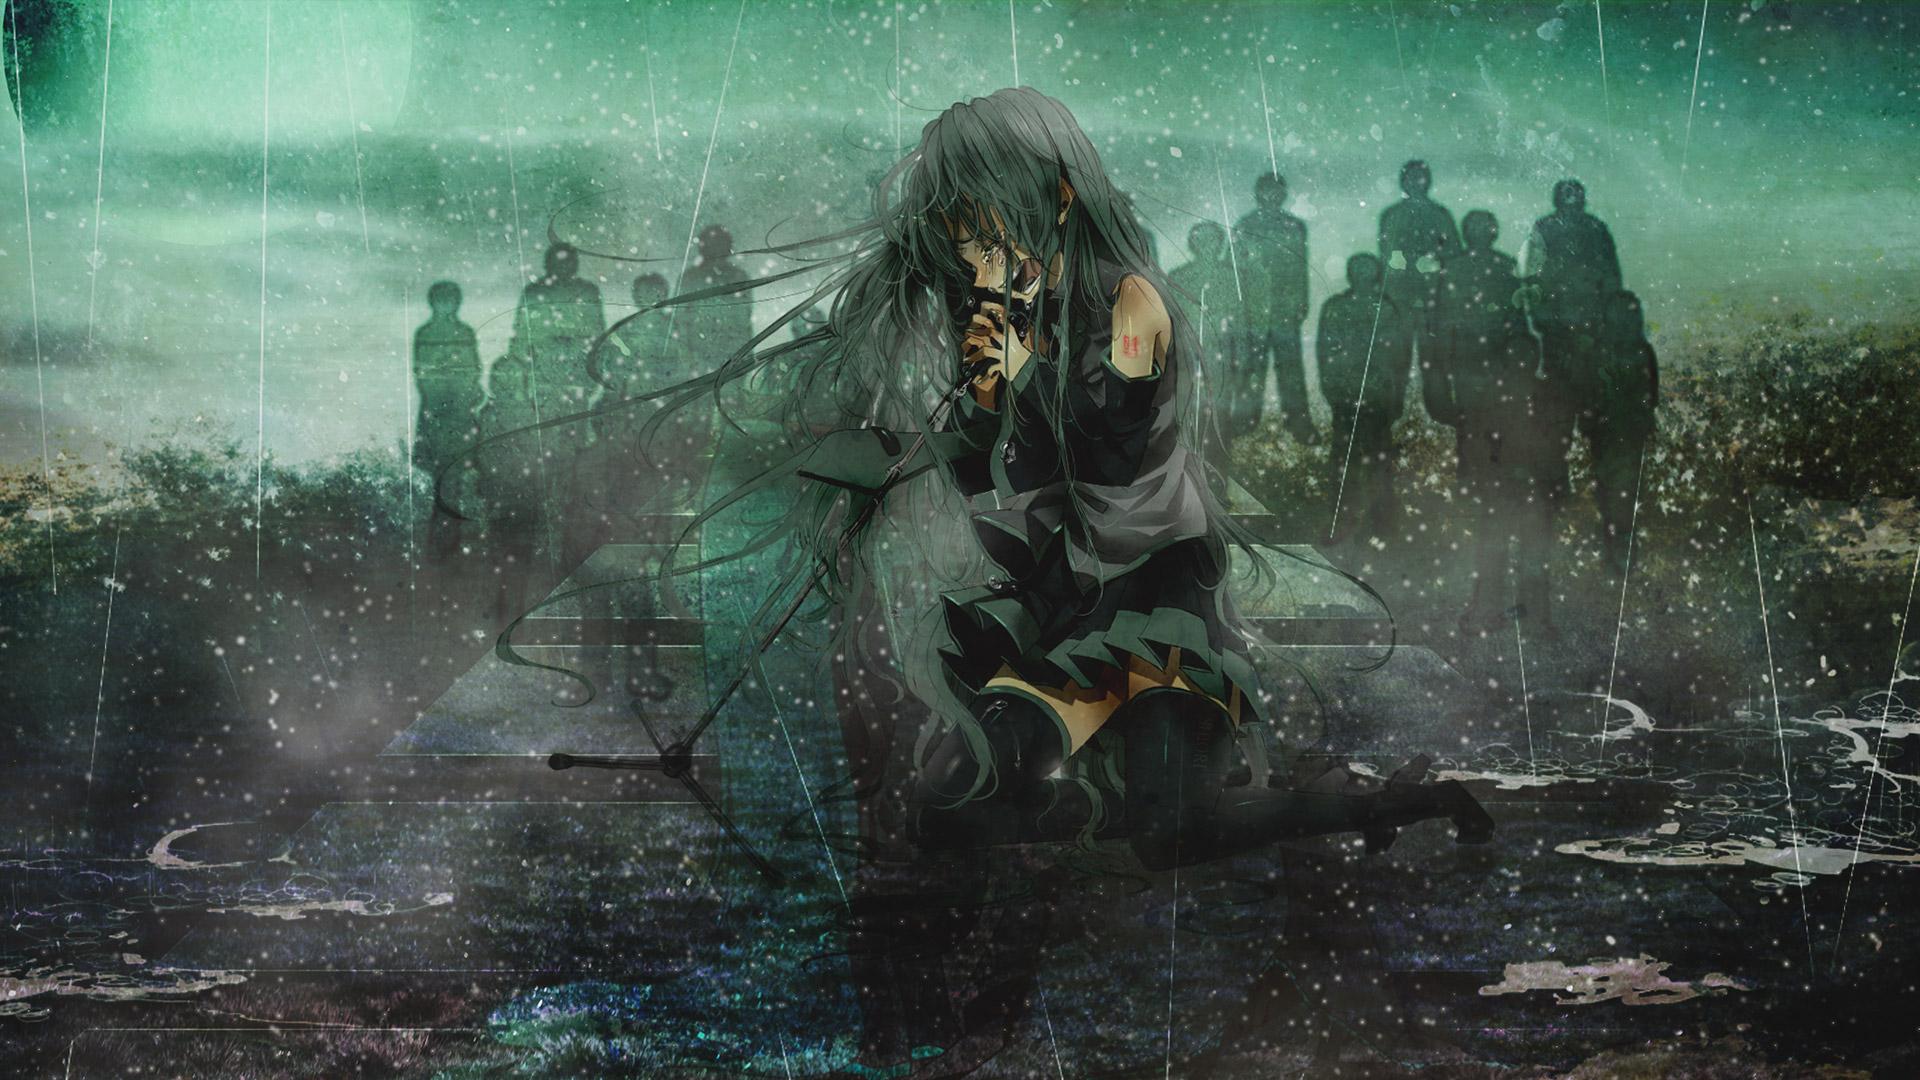 Anime Vocaloid Hatsune Miku, HD Anime, 4k Wallpapers ...